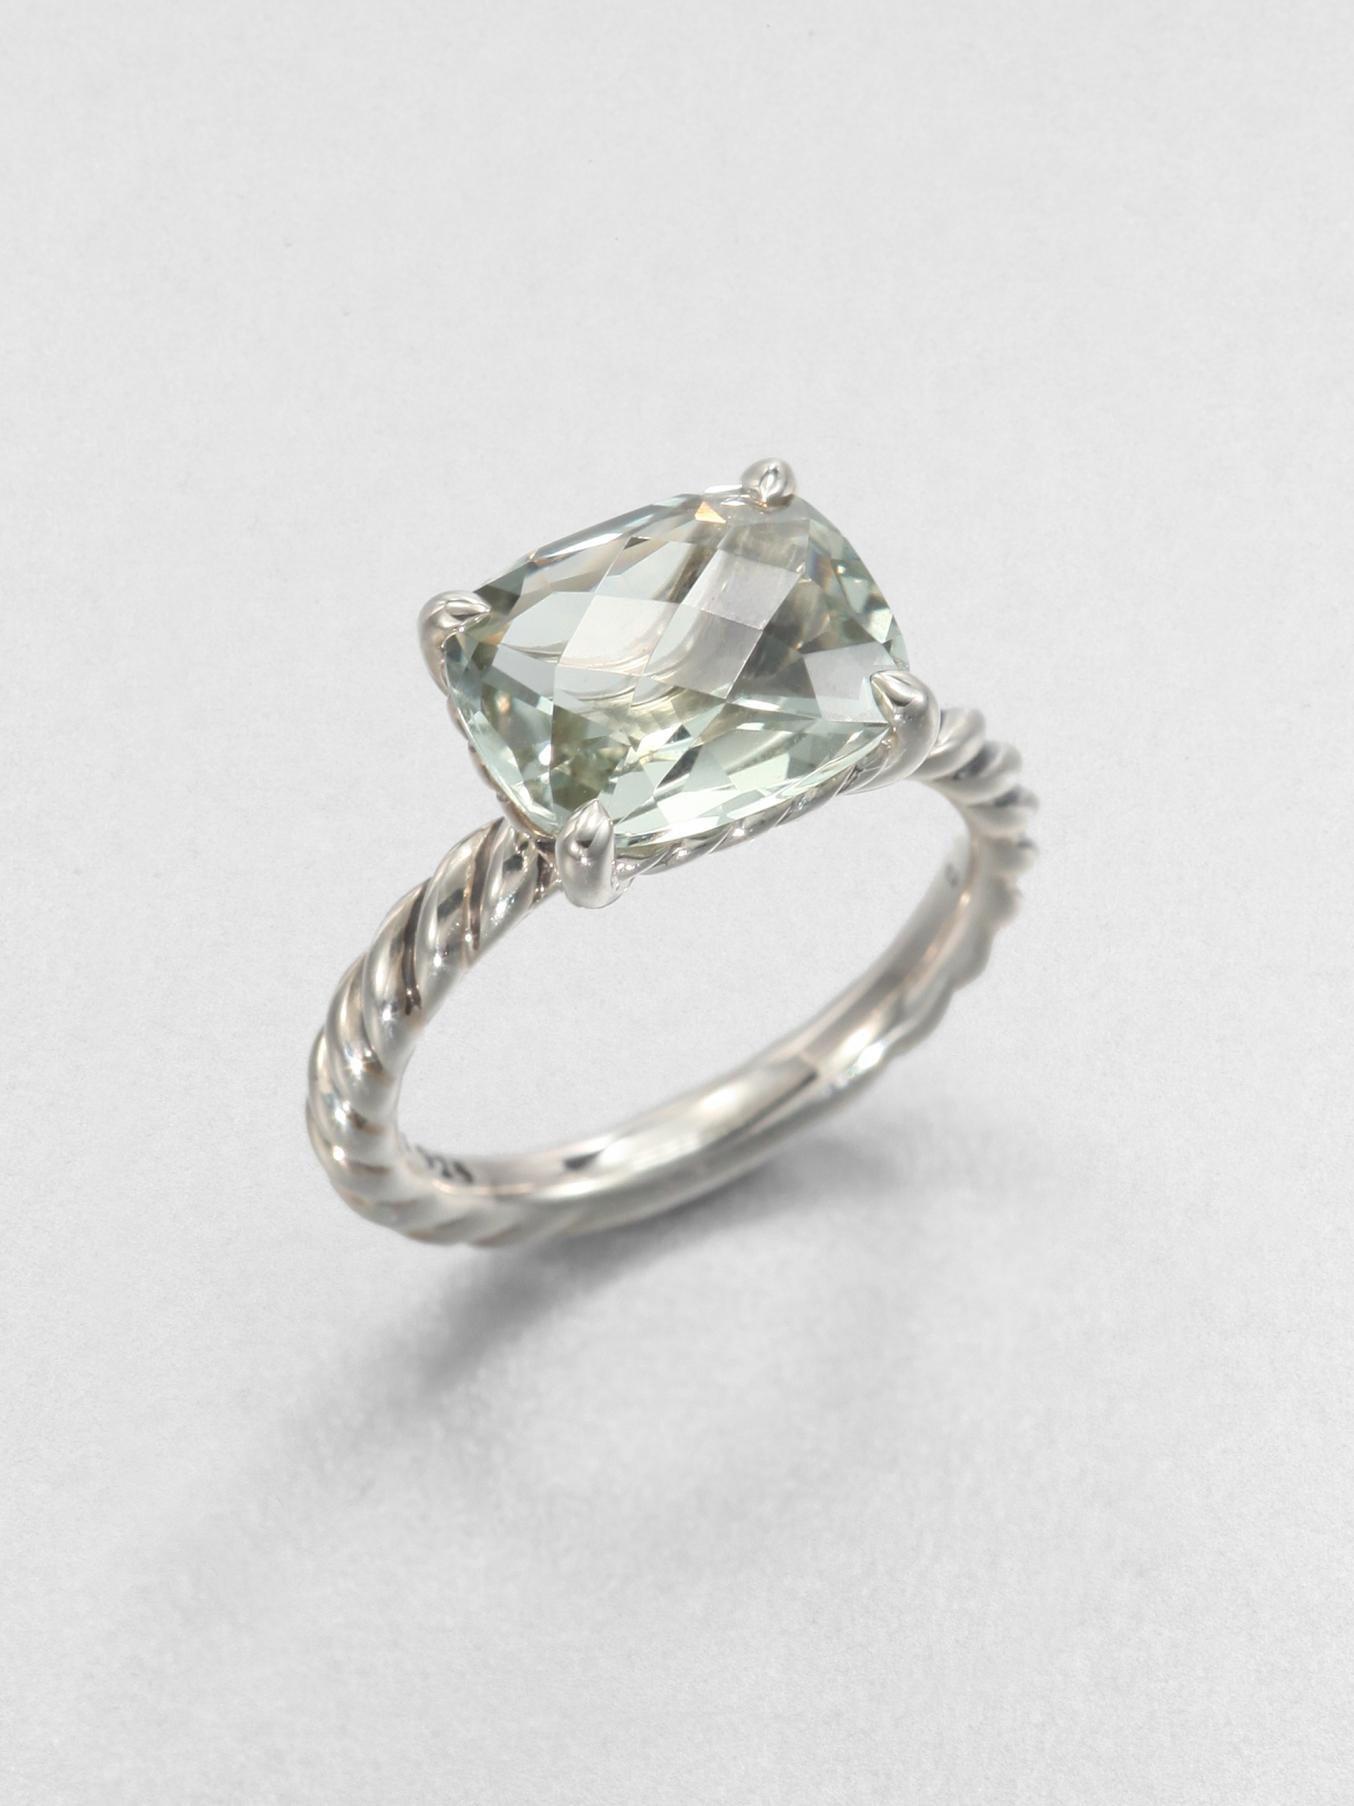 david yurman prasiolite and sterling silver ring in silver